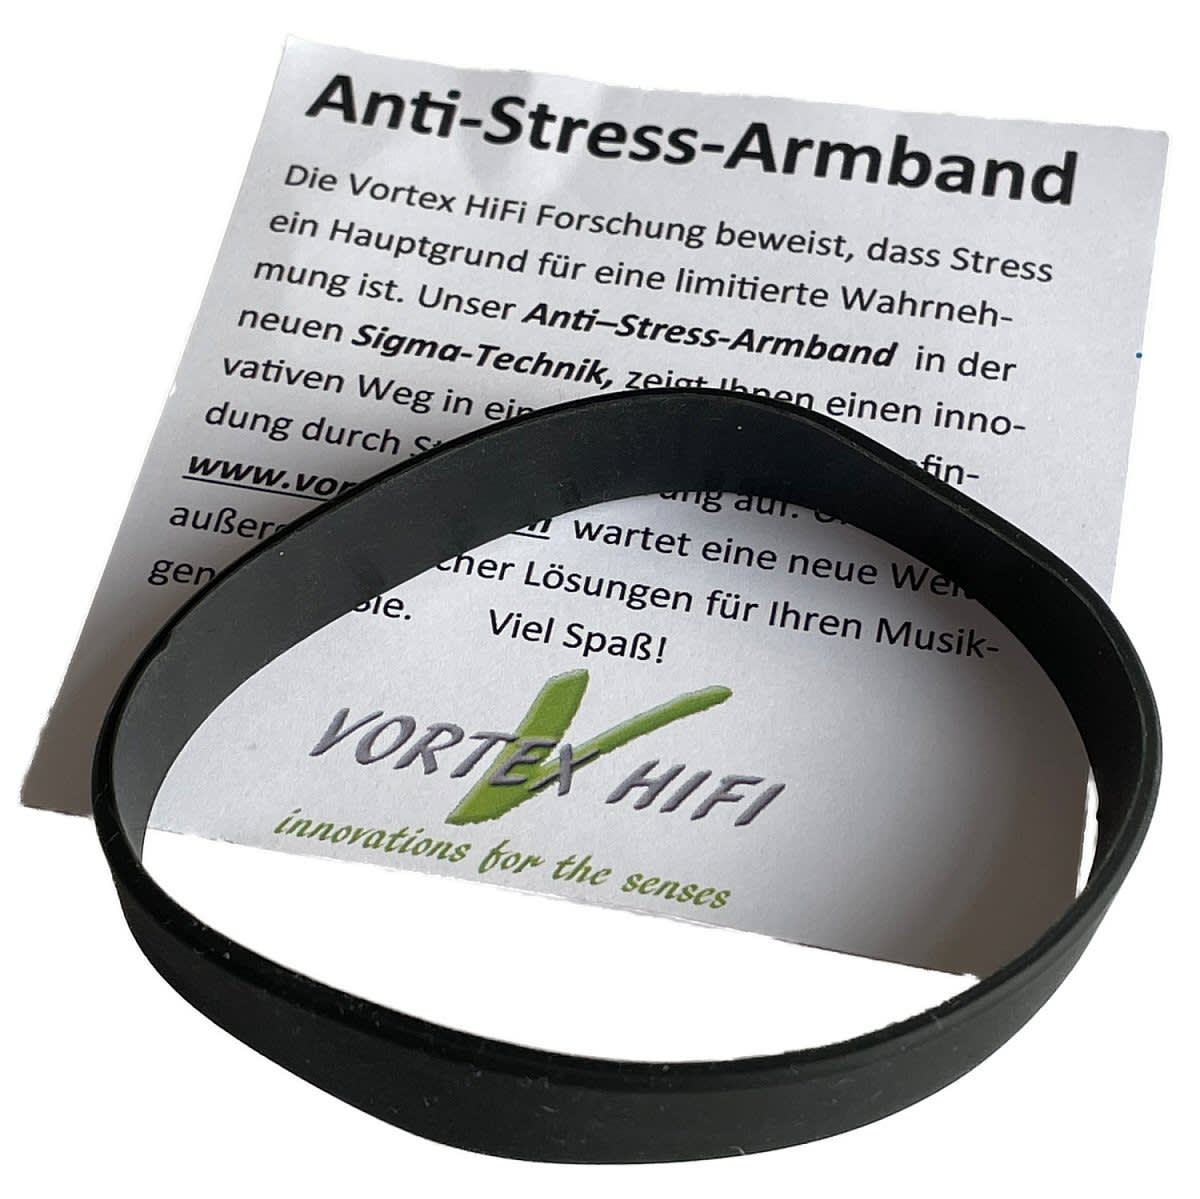 Vortex Hifi Anti Stress armband